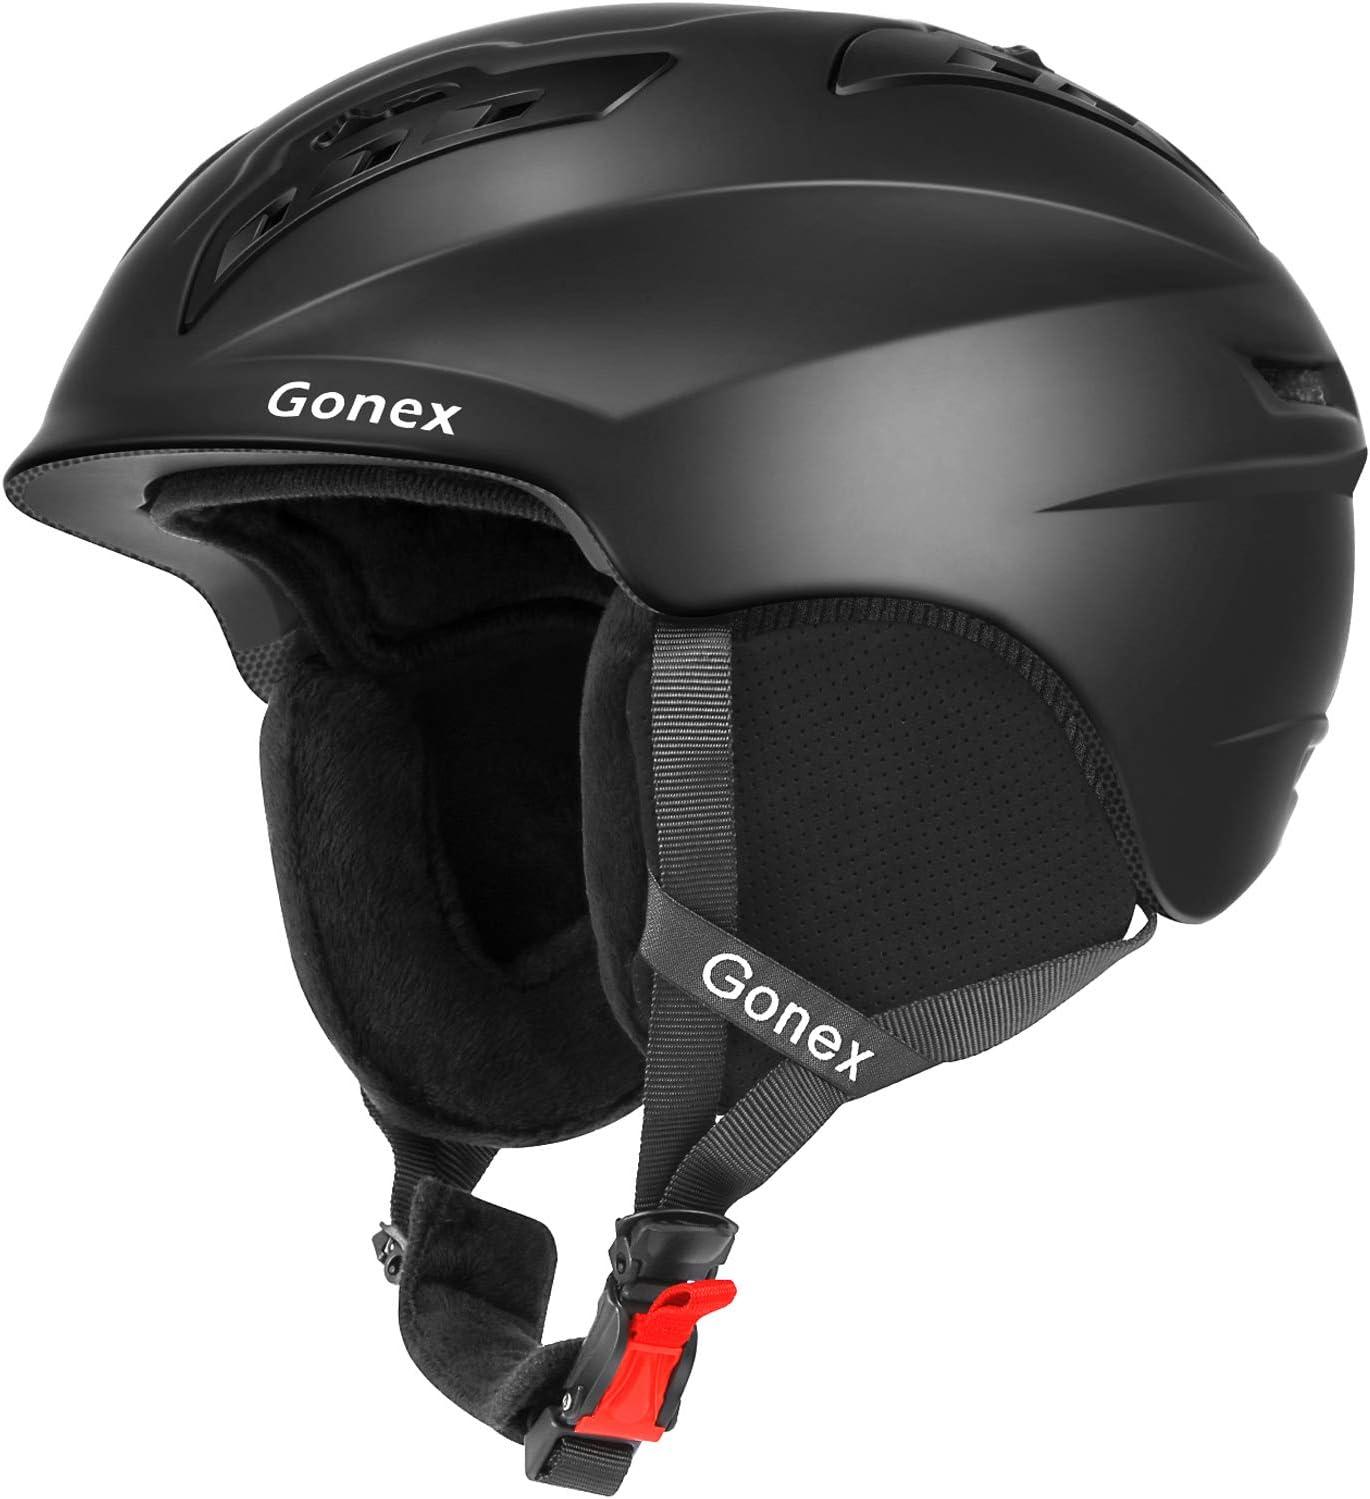 Gonex Ski Helmet, Winter Snow Snowboard Skiing Helmet with Safety Certificate for Men, Women Young, Matte Black White Gray Blue, M L Size